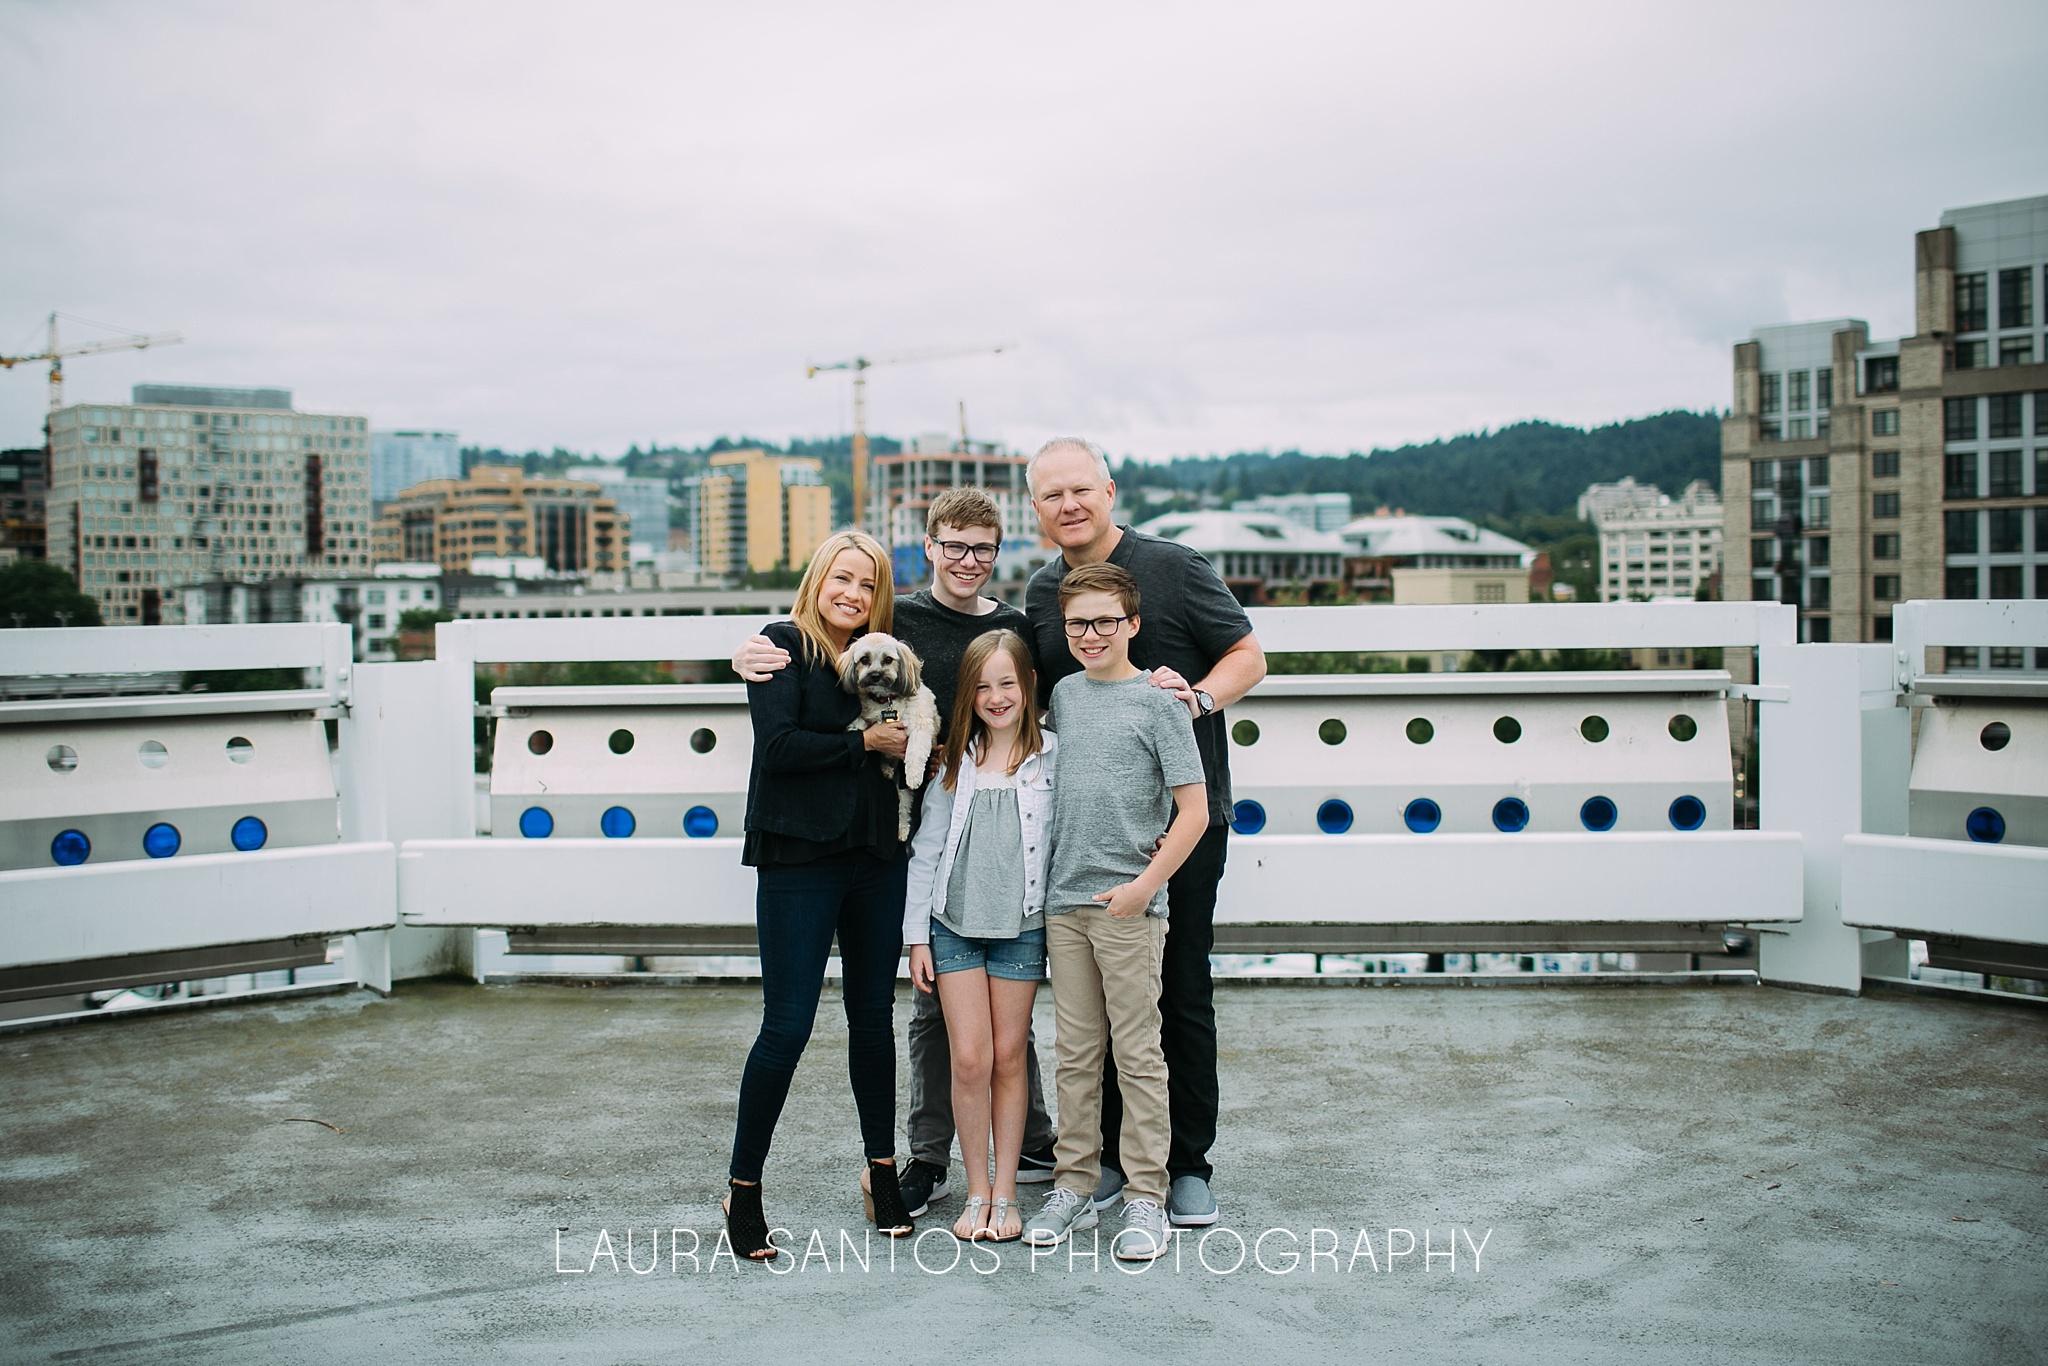 Laura Santos Photography Portland Oregon Family Photographer_0444.jpg